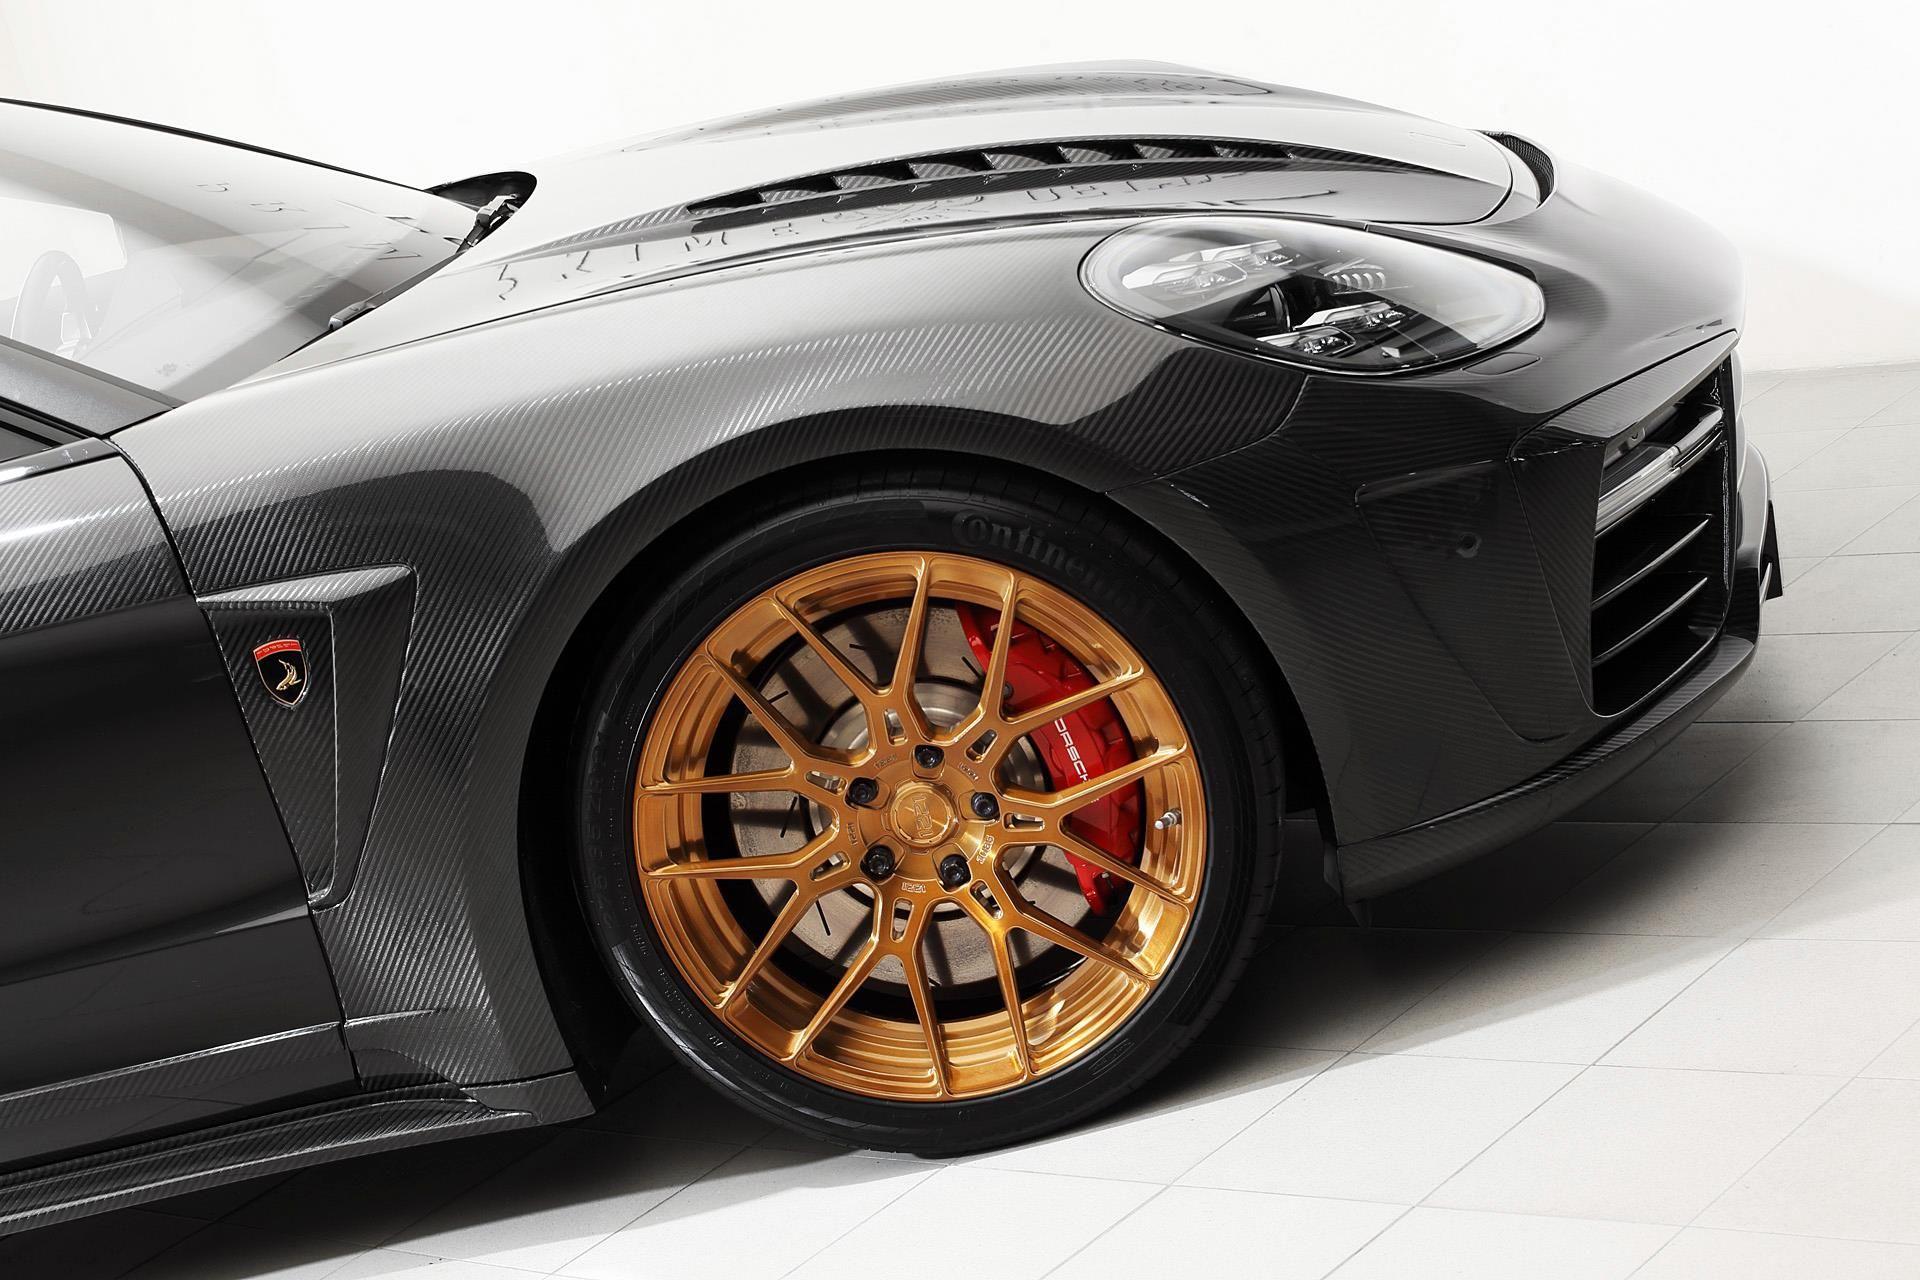 Porsche_Panamera_GTR_Carbon_Edition_by_TopCar_0007